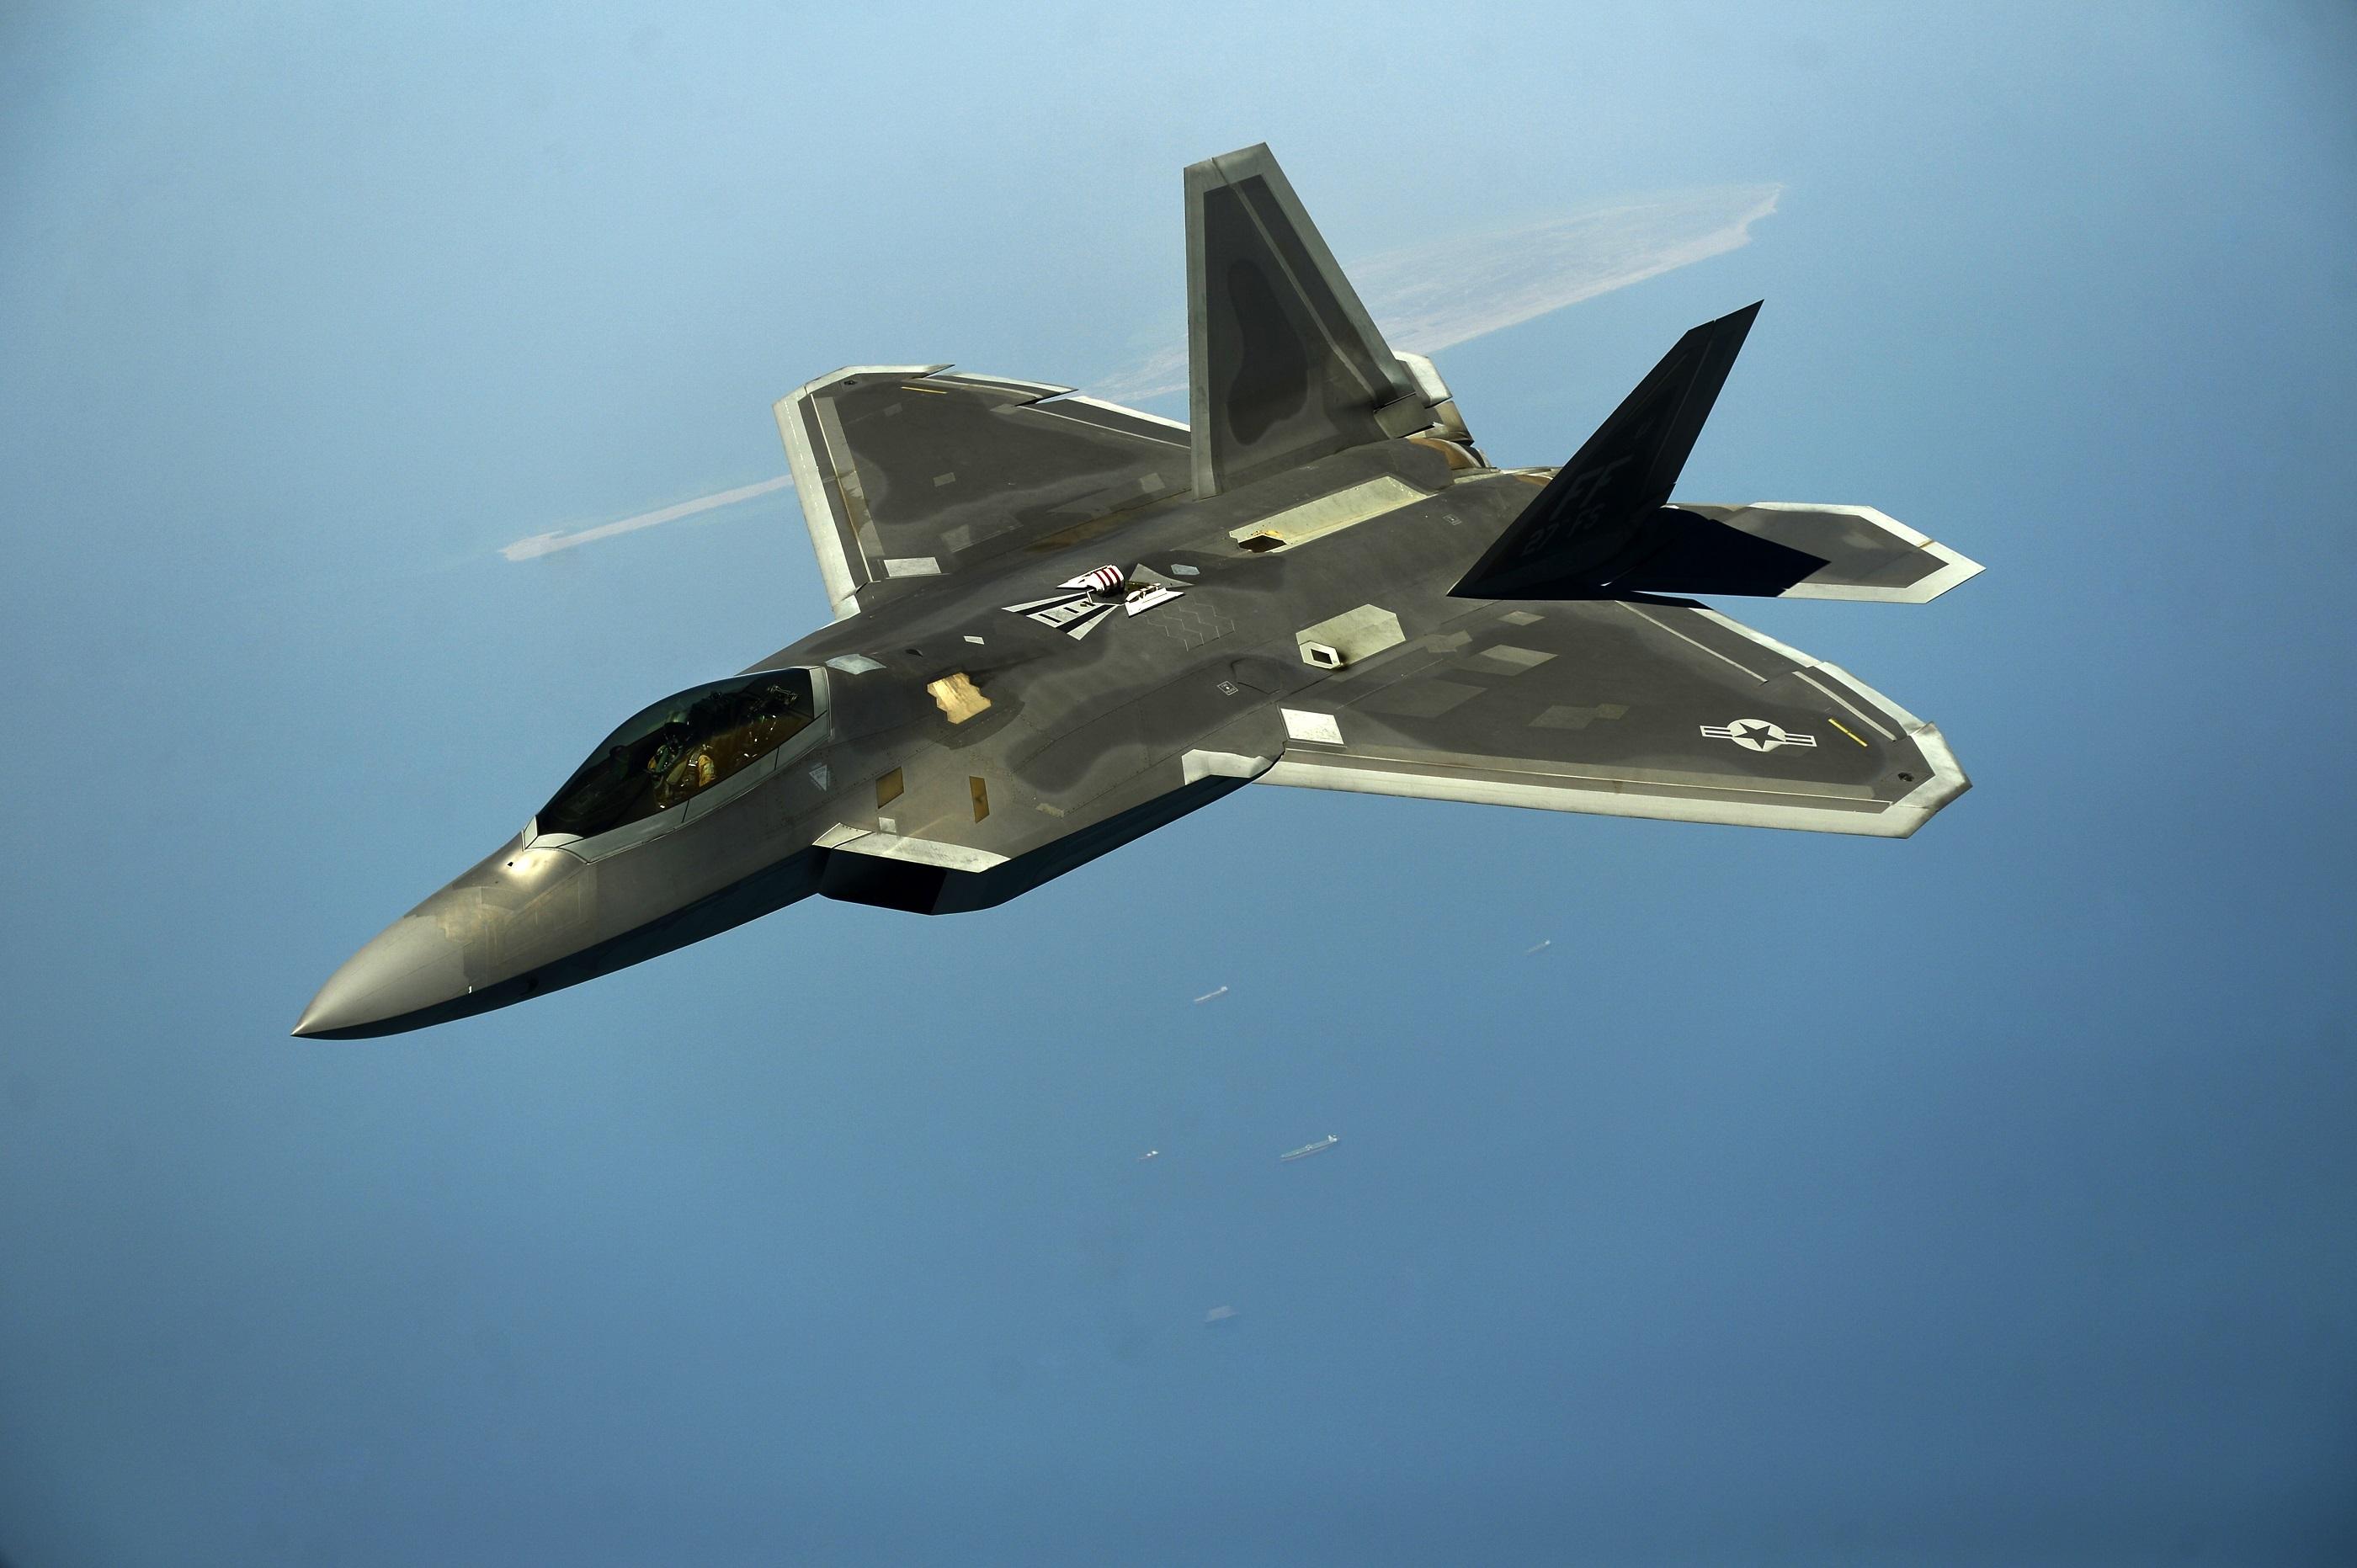 Lockheed Martin F 22 Raptor Black Hd Wallpaper